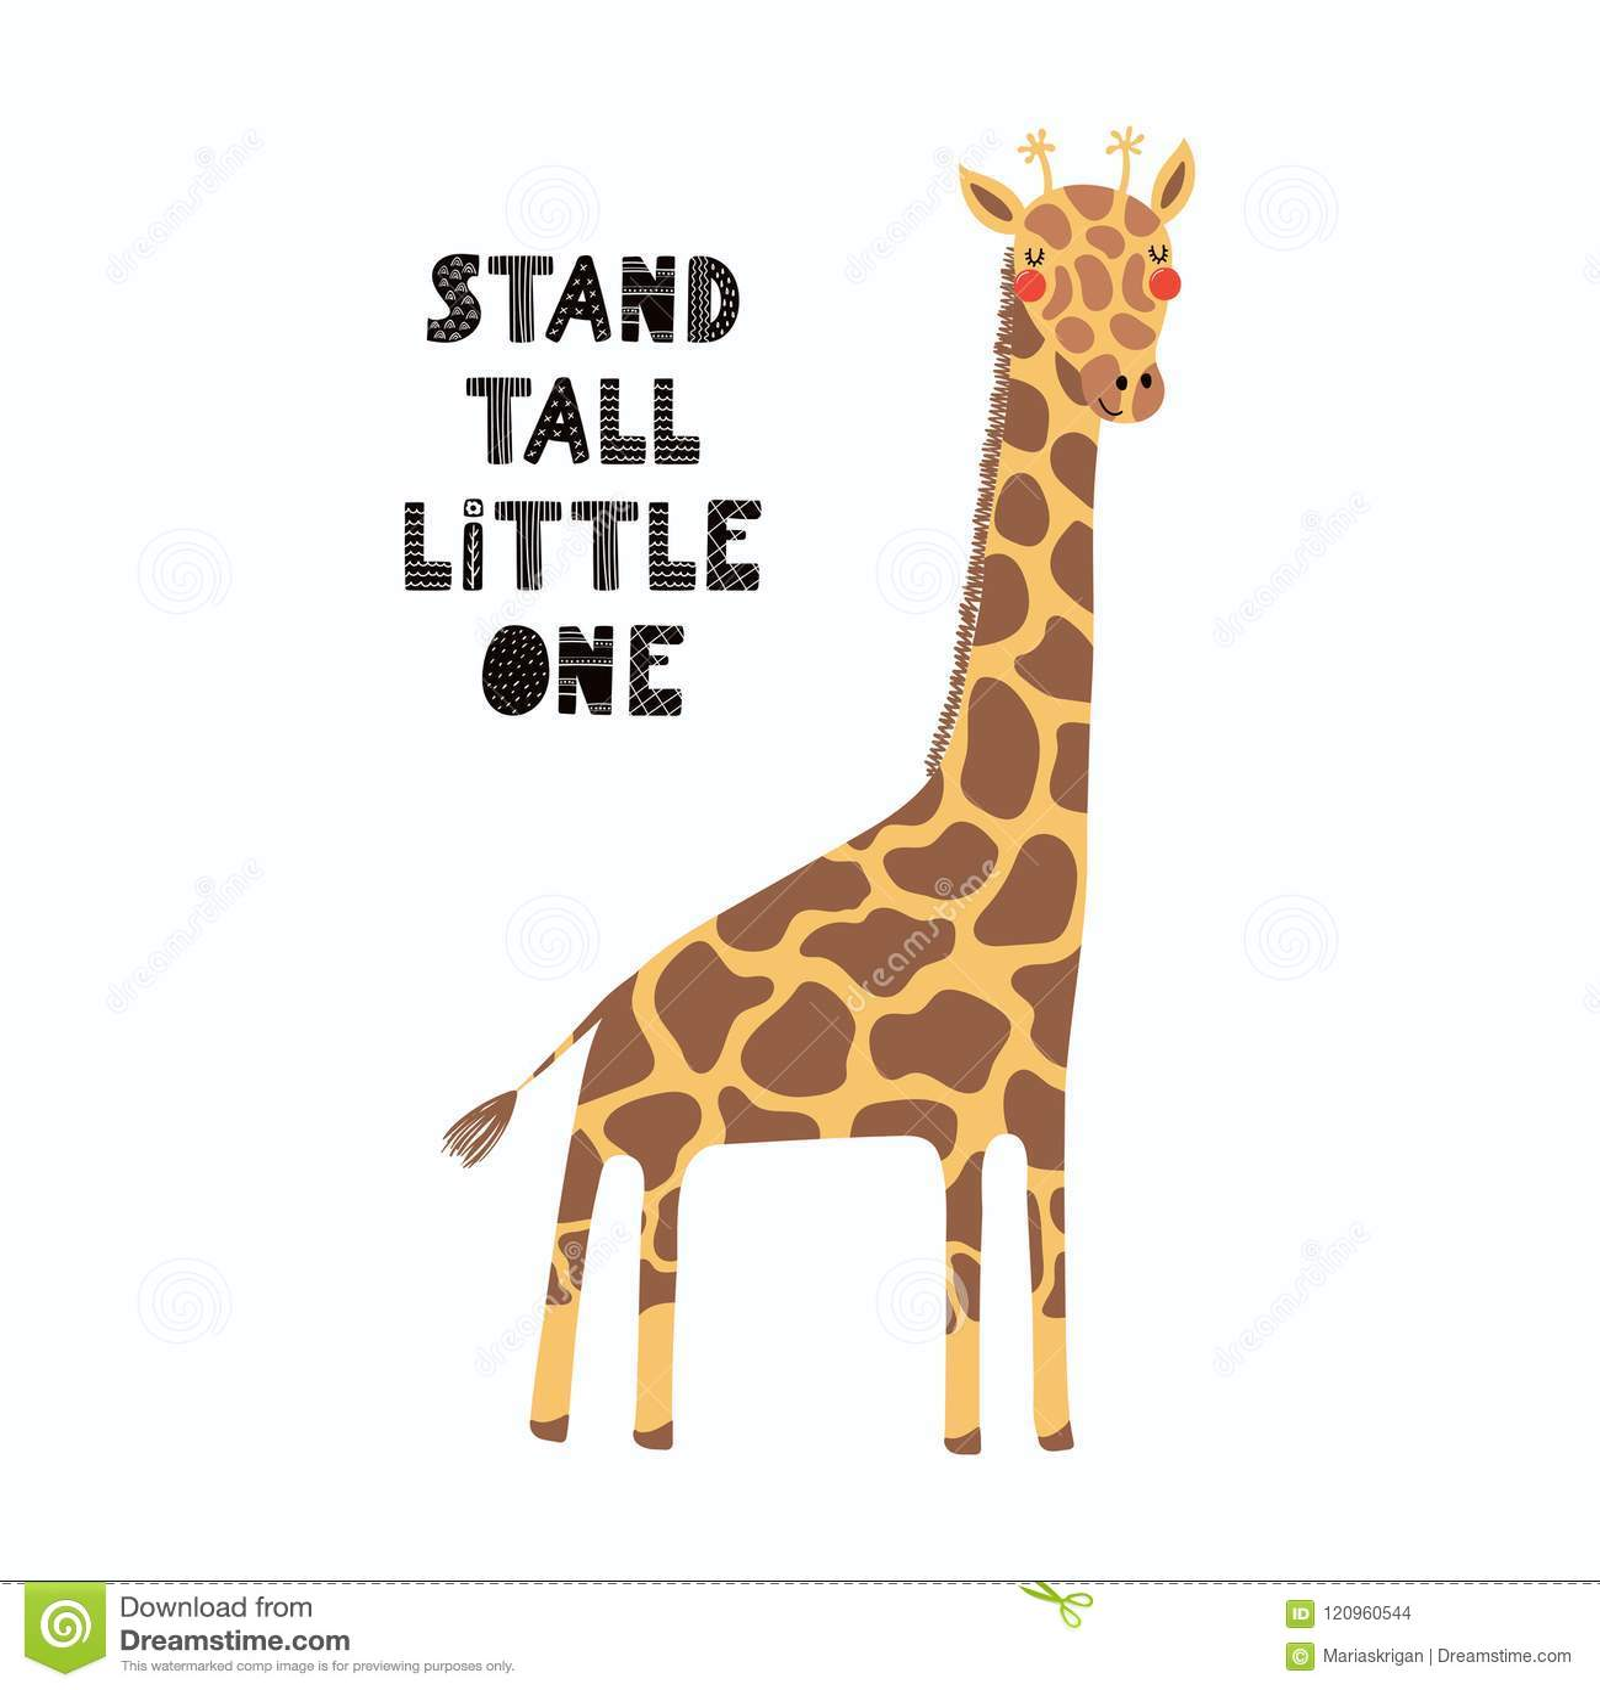 Giraffe Quotes Funny: Cute Giraffe Card Stock Vector. Illustration Of Adventure